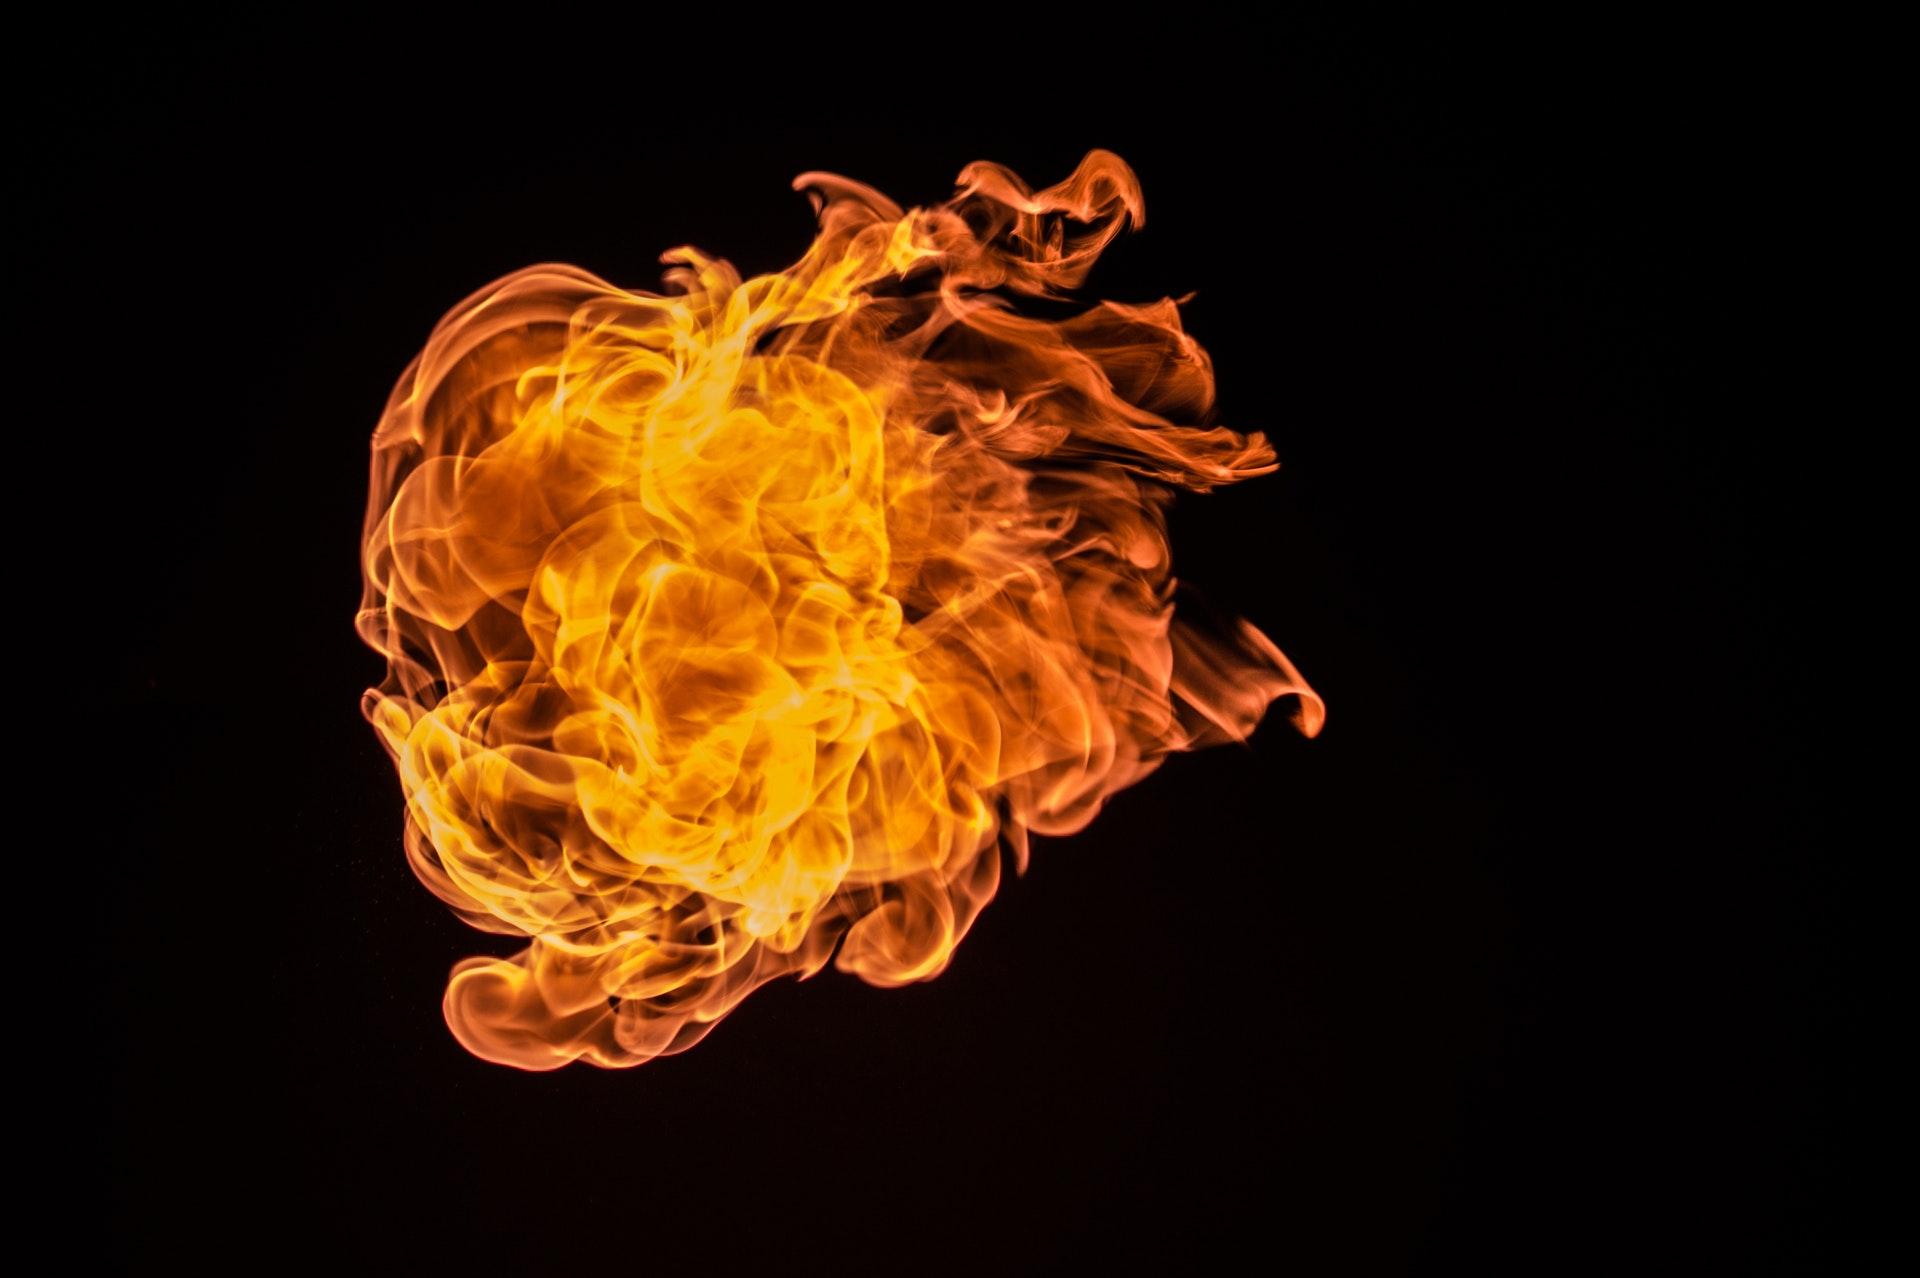 fire-hell-inferno-auto-tune